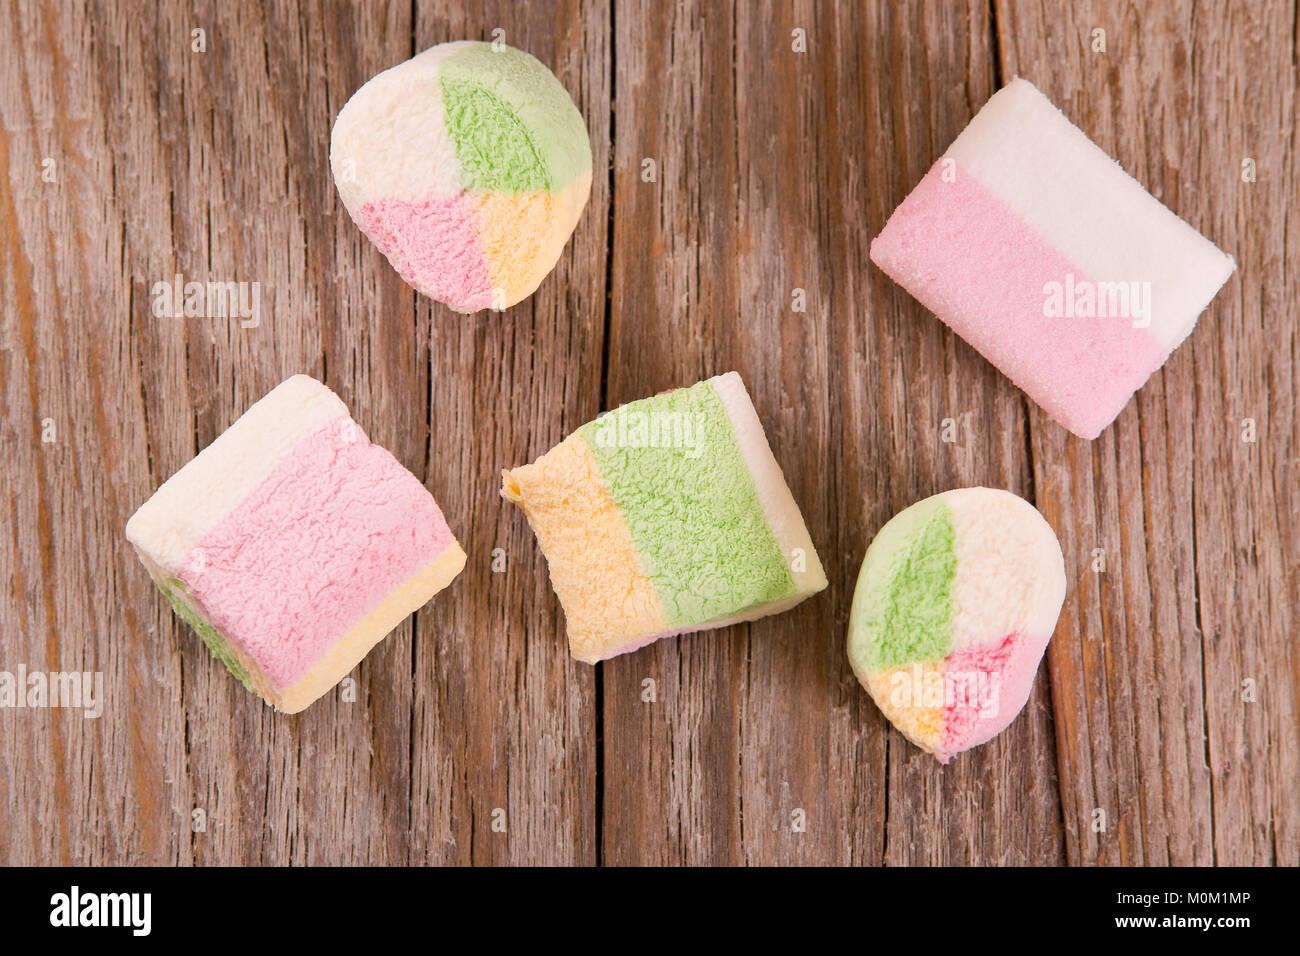 Marshmallows on wooden table. - Stock Image